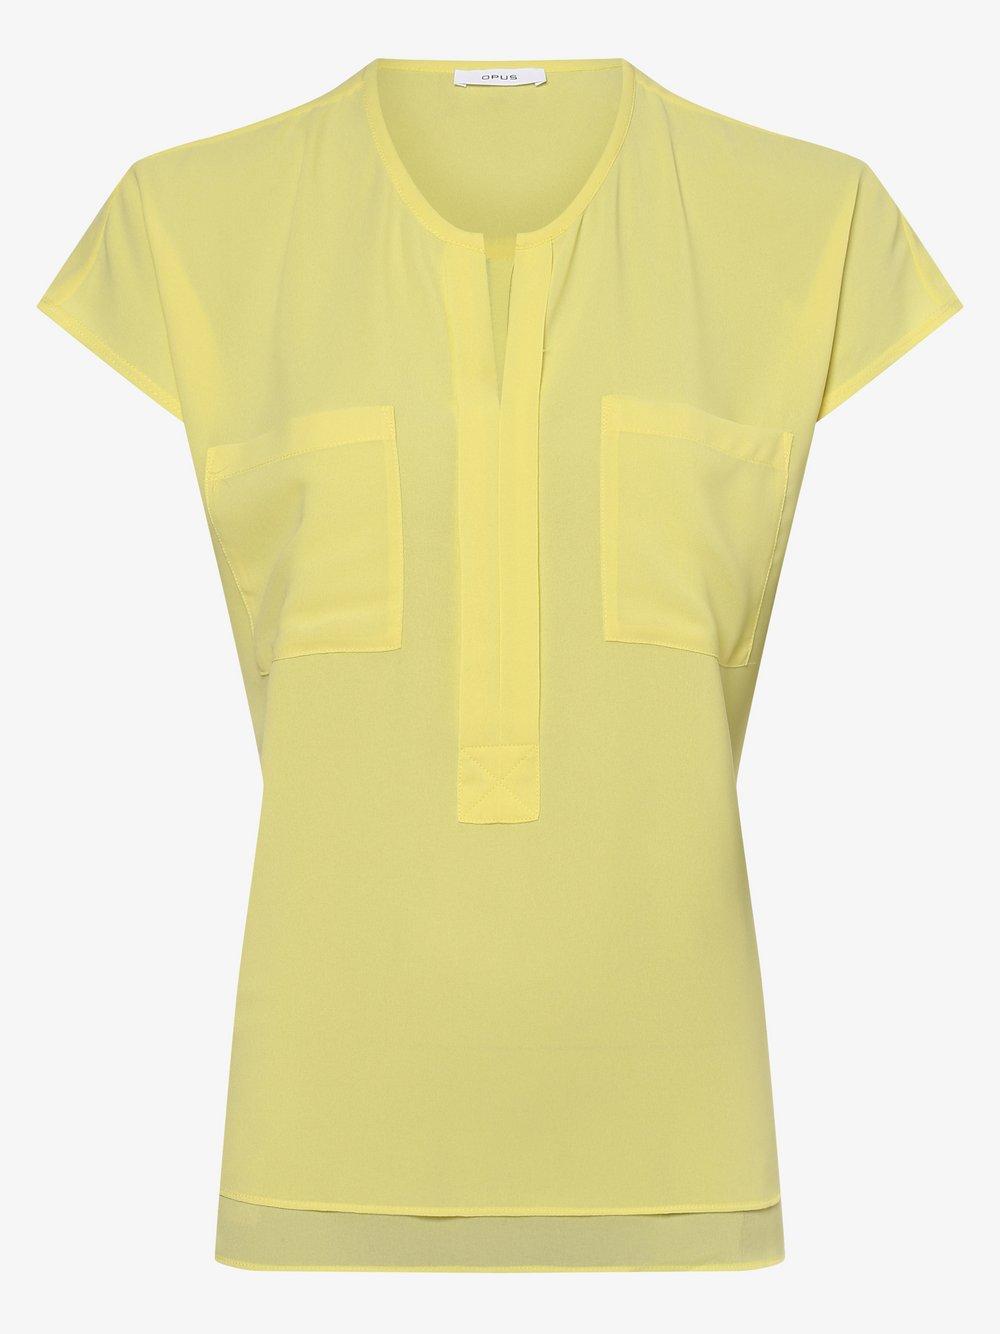 Opus – Bluzka damska – Flusi, żółty Van Graaf 475159-0002-00380